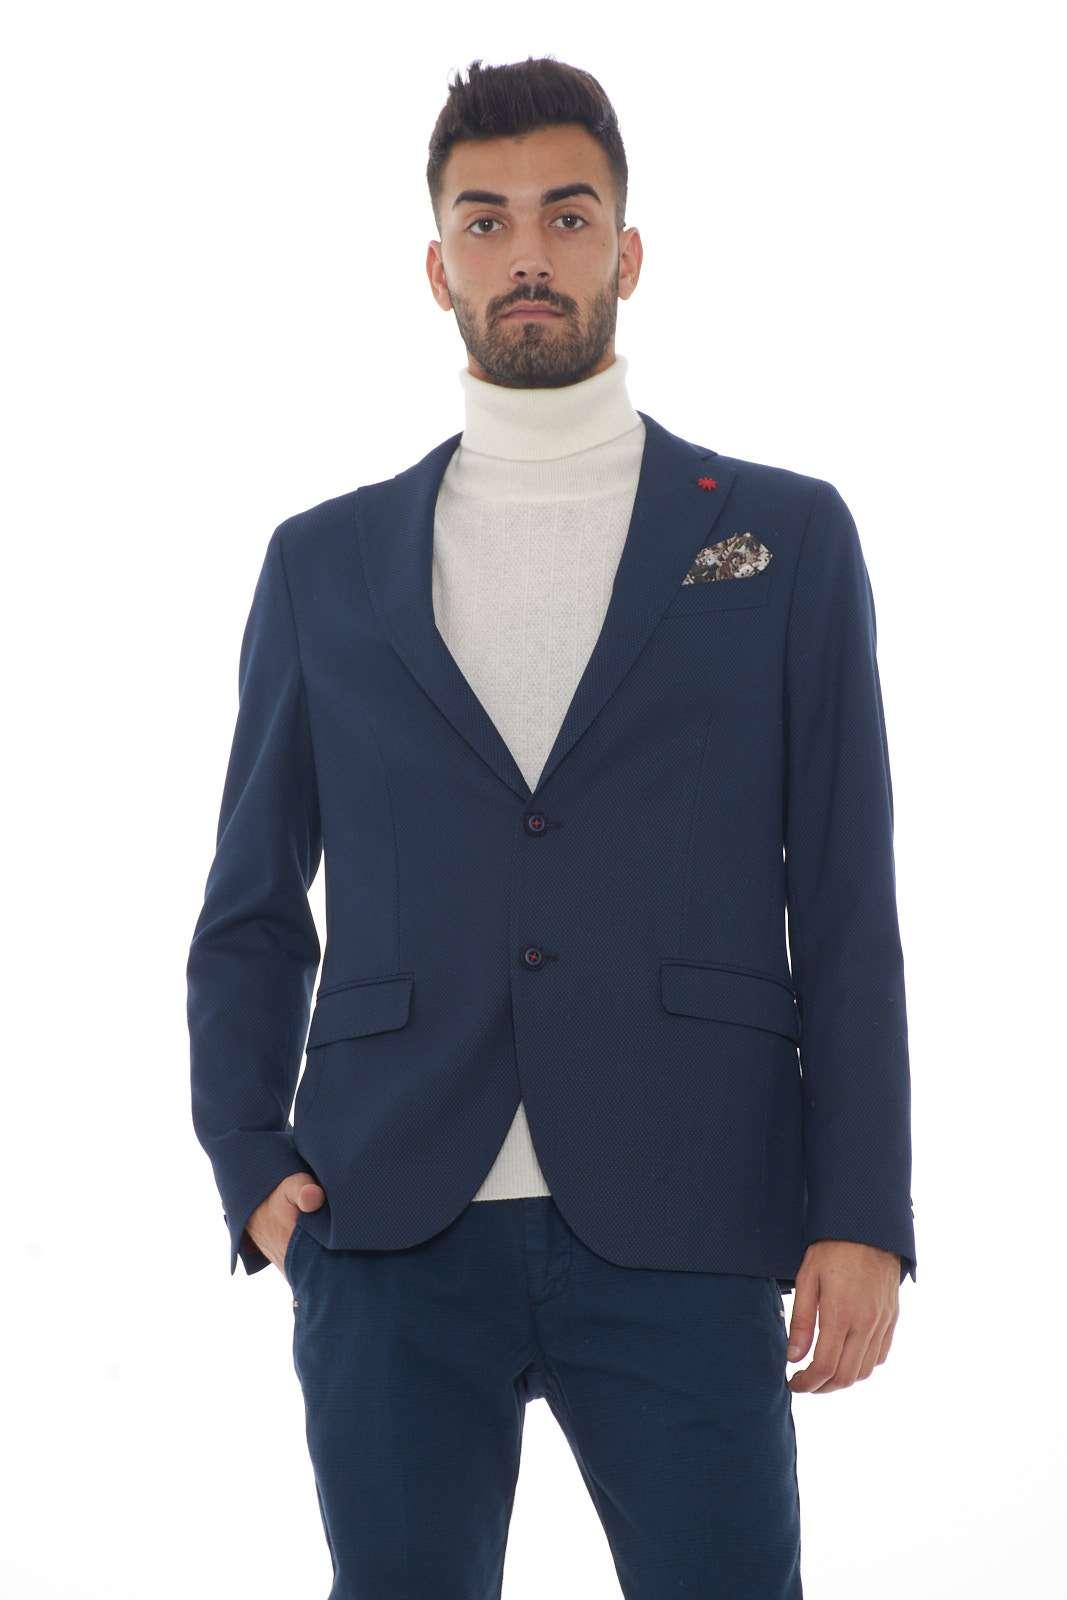 https://www.parmax.com/media/catalog/product/a/i/AI-outlet_parmax-giacca-uomo-Manuel-Ritz-2732G2068%20193534-A.jpg